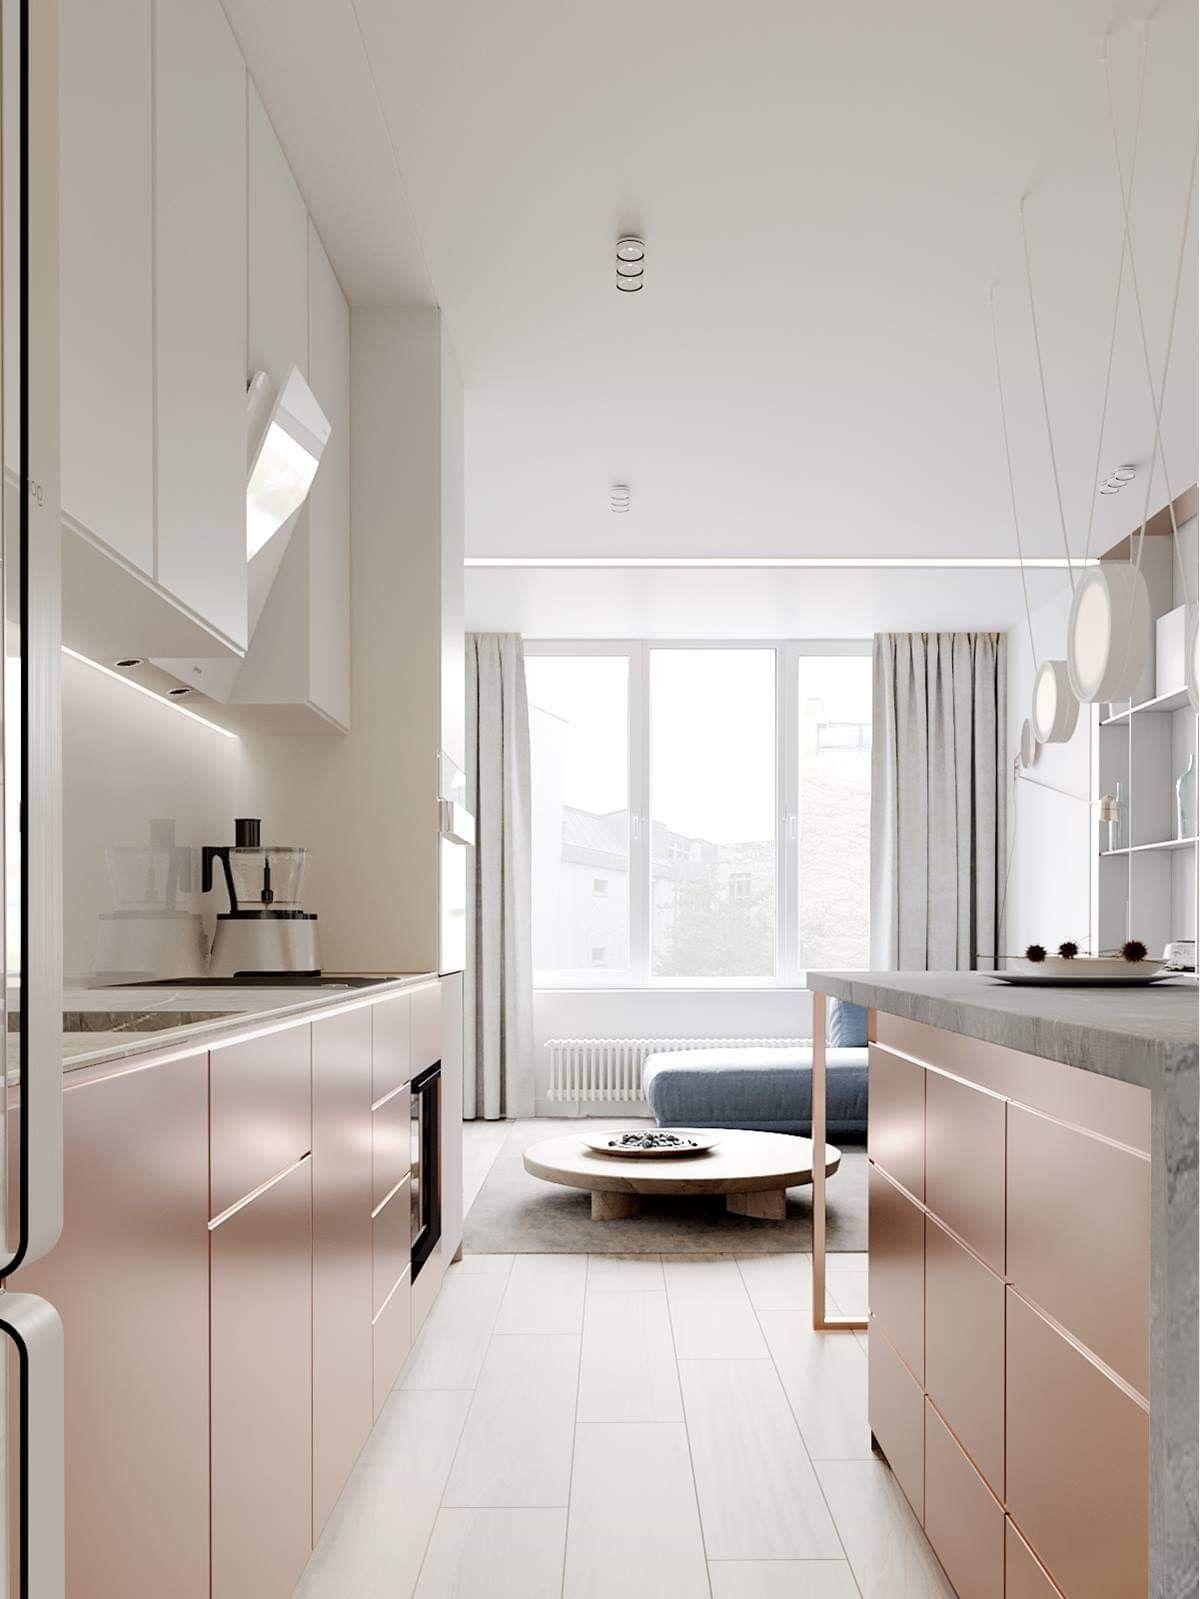 Cor rose gold room interior ideas home design counter also pin by shahriyar shojaie on apartment rh pinterest